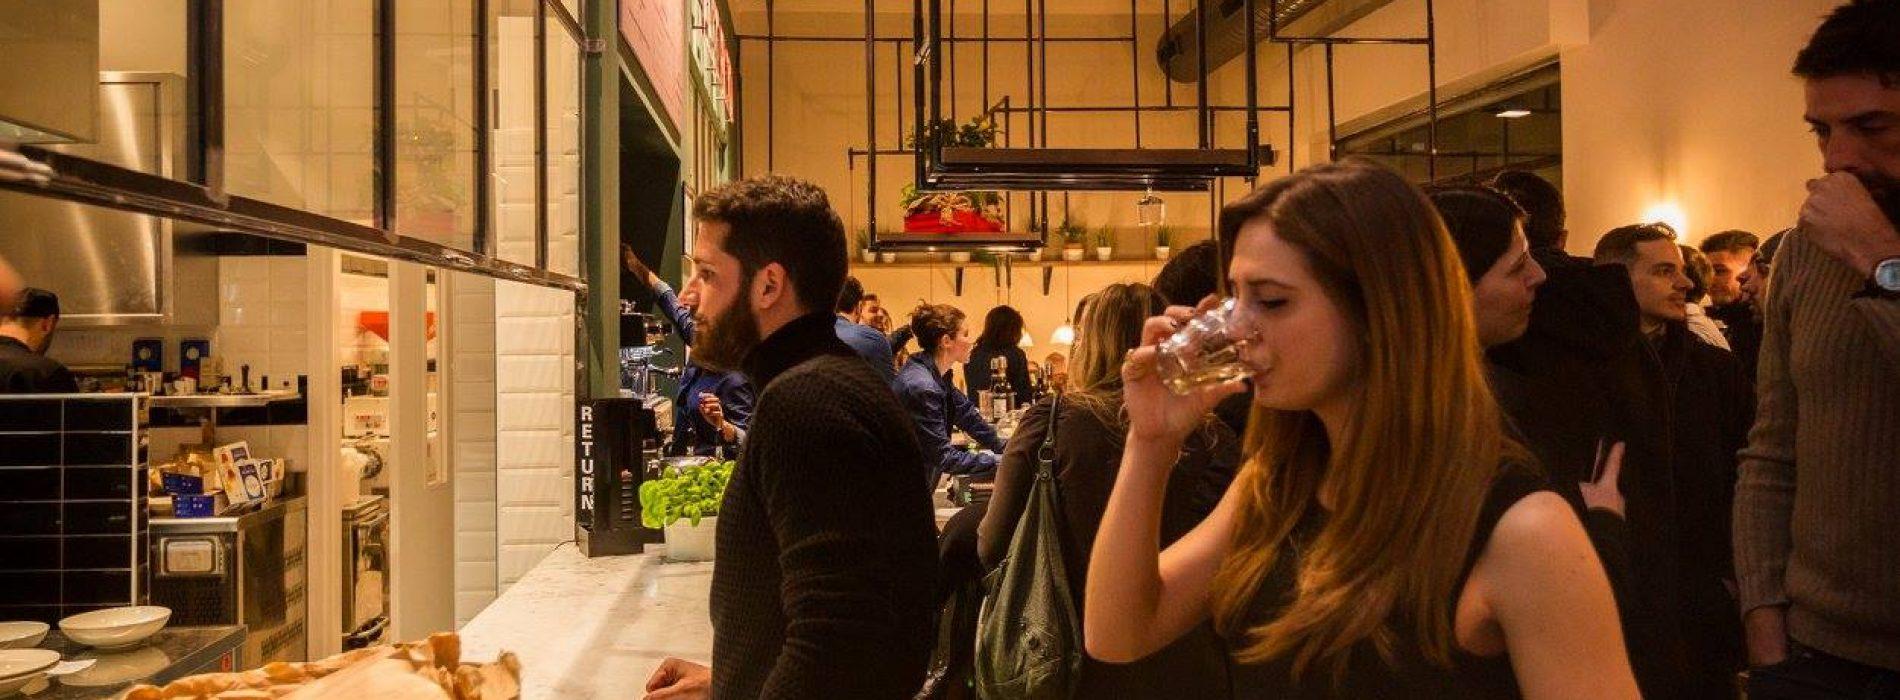 Nuove aperture Milano marzo 2017: raddoppiano SlowSud Muciulerie e Frie'n'Fuie, e poi Pizzium e MiScusi